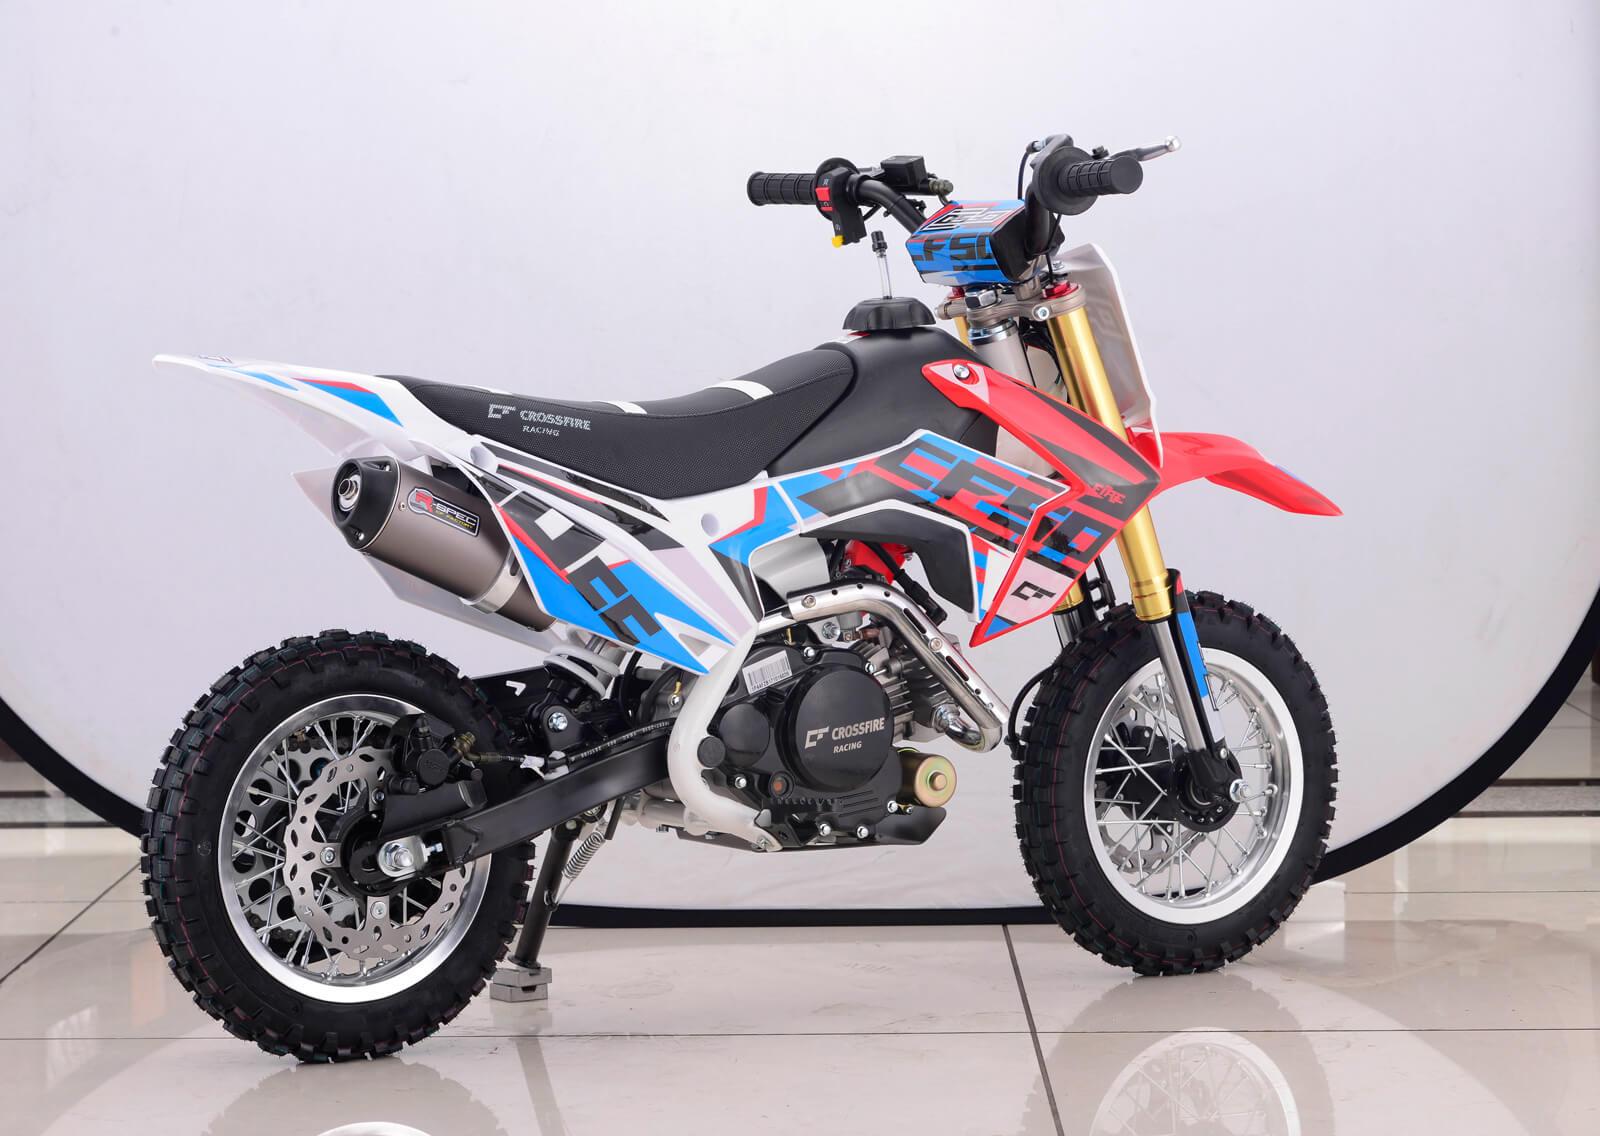 crossfire-cf50-motorbike-dirt-children-kids-red-6